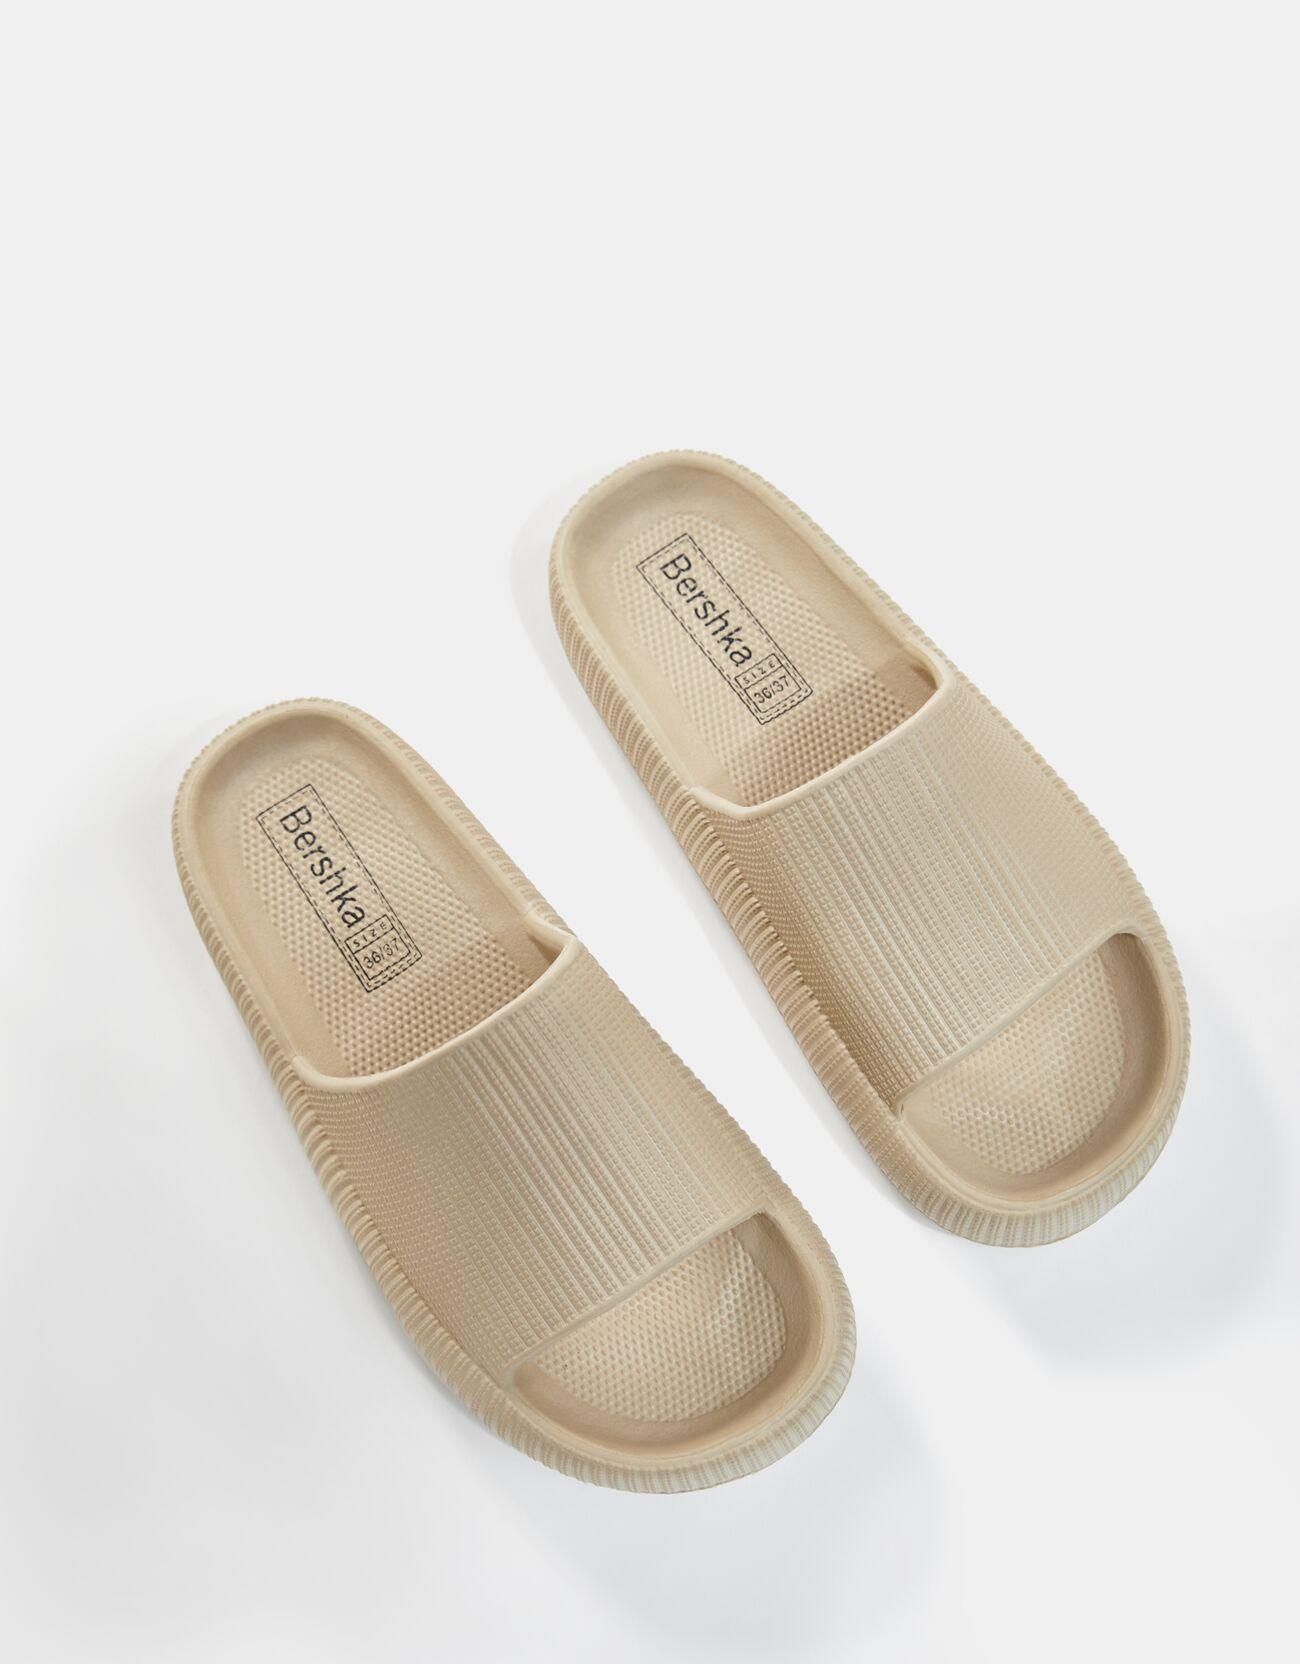 Sandalia plana textura